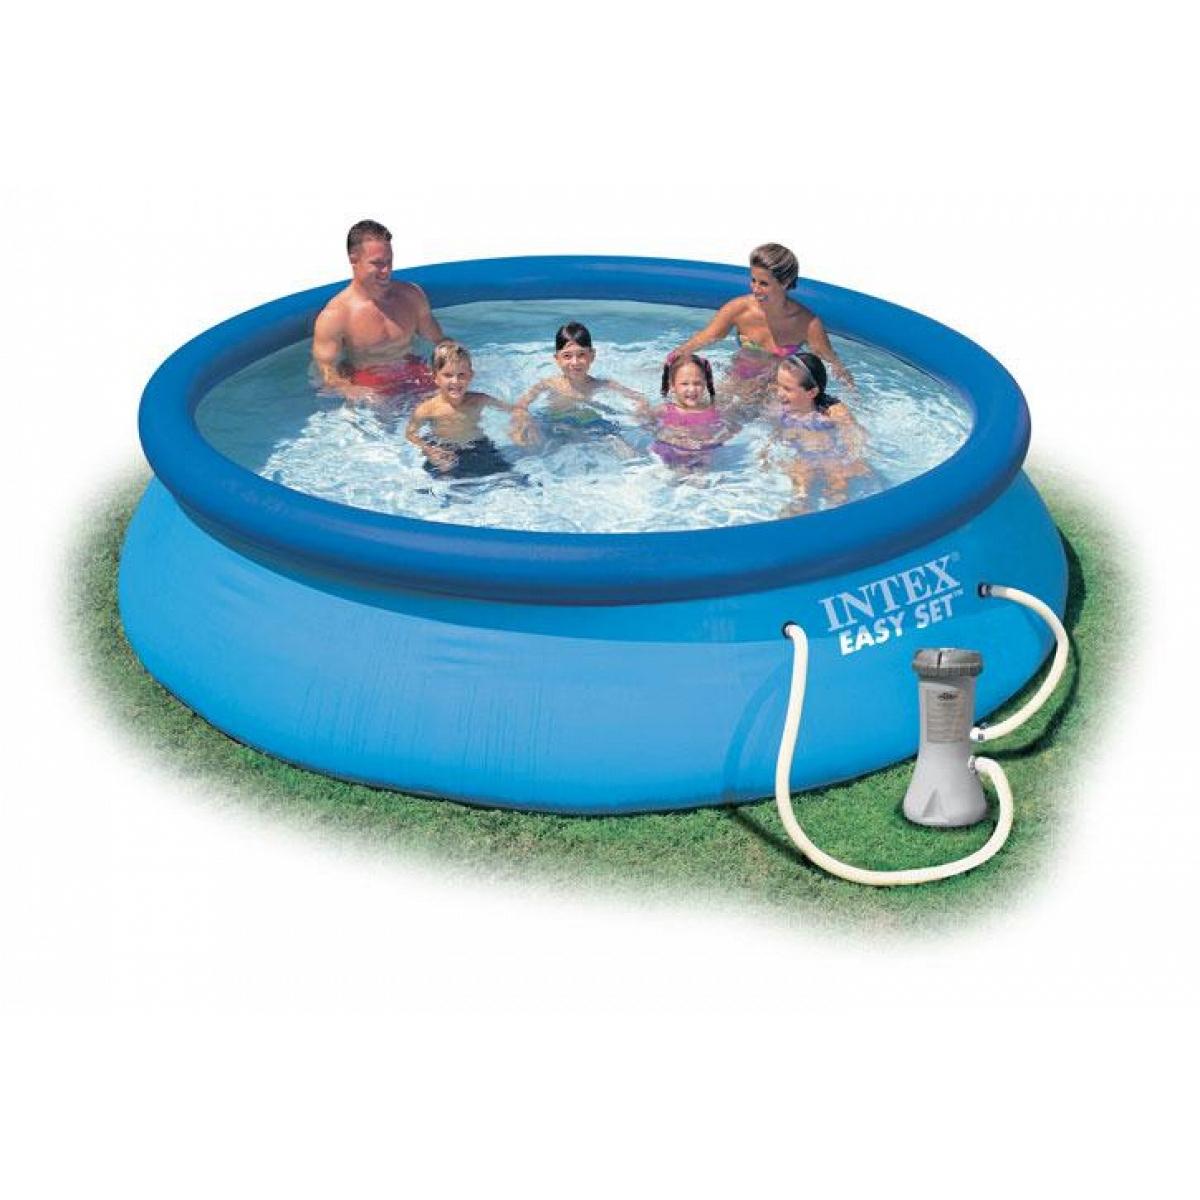 Round Pool Intex 366X76 Mod. Easy Set Intex Piscine pour Liner Piscine Intex